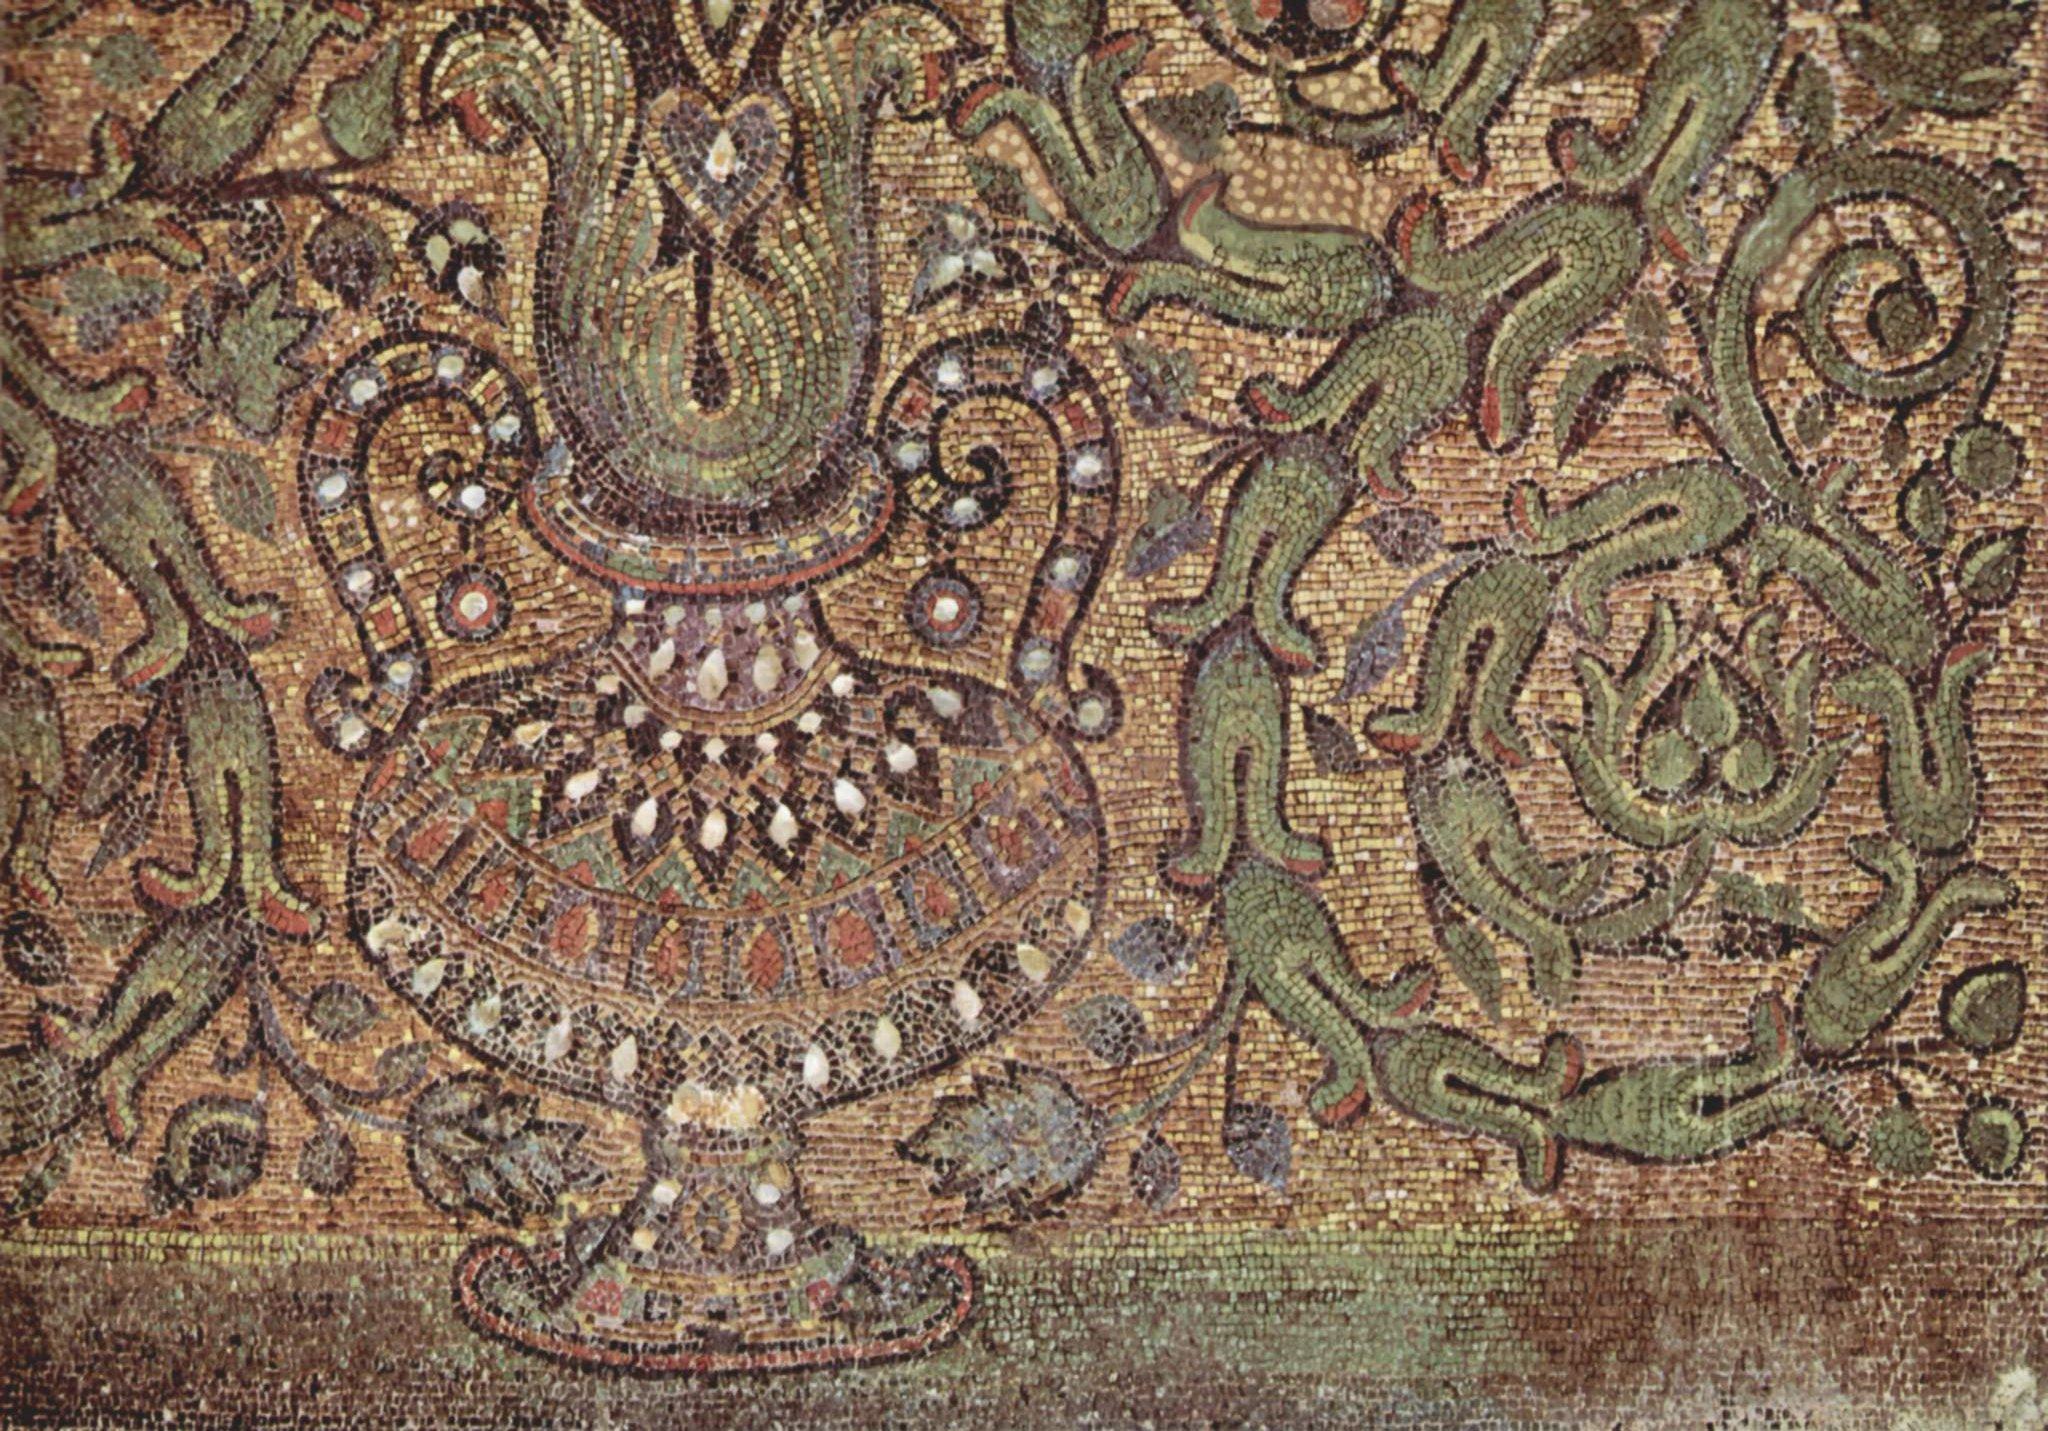 Arabesque Byzantine times, 680.